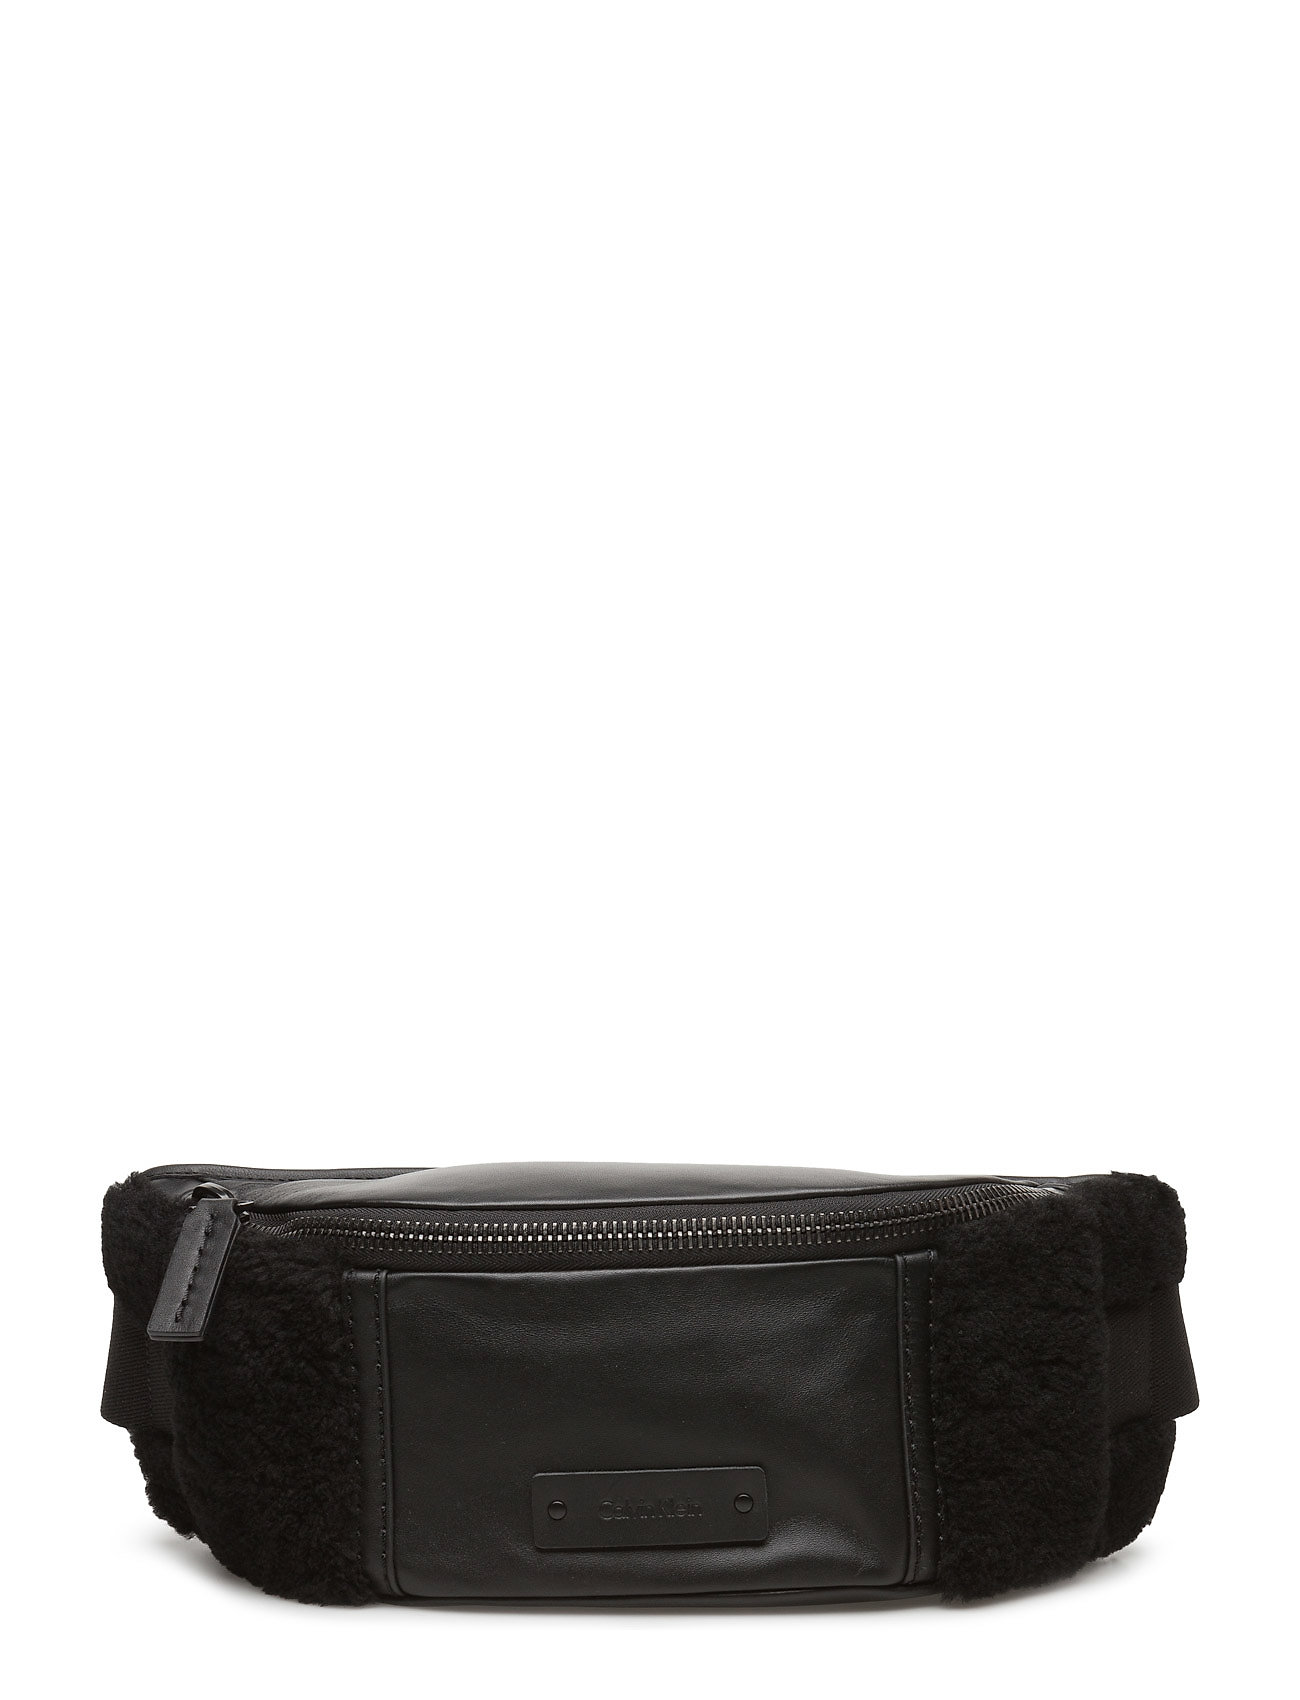 calvin klein – Theo waistbag, 001, på boozt.com dk